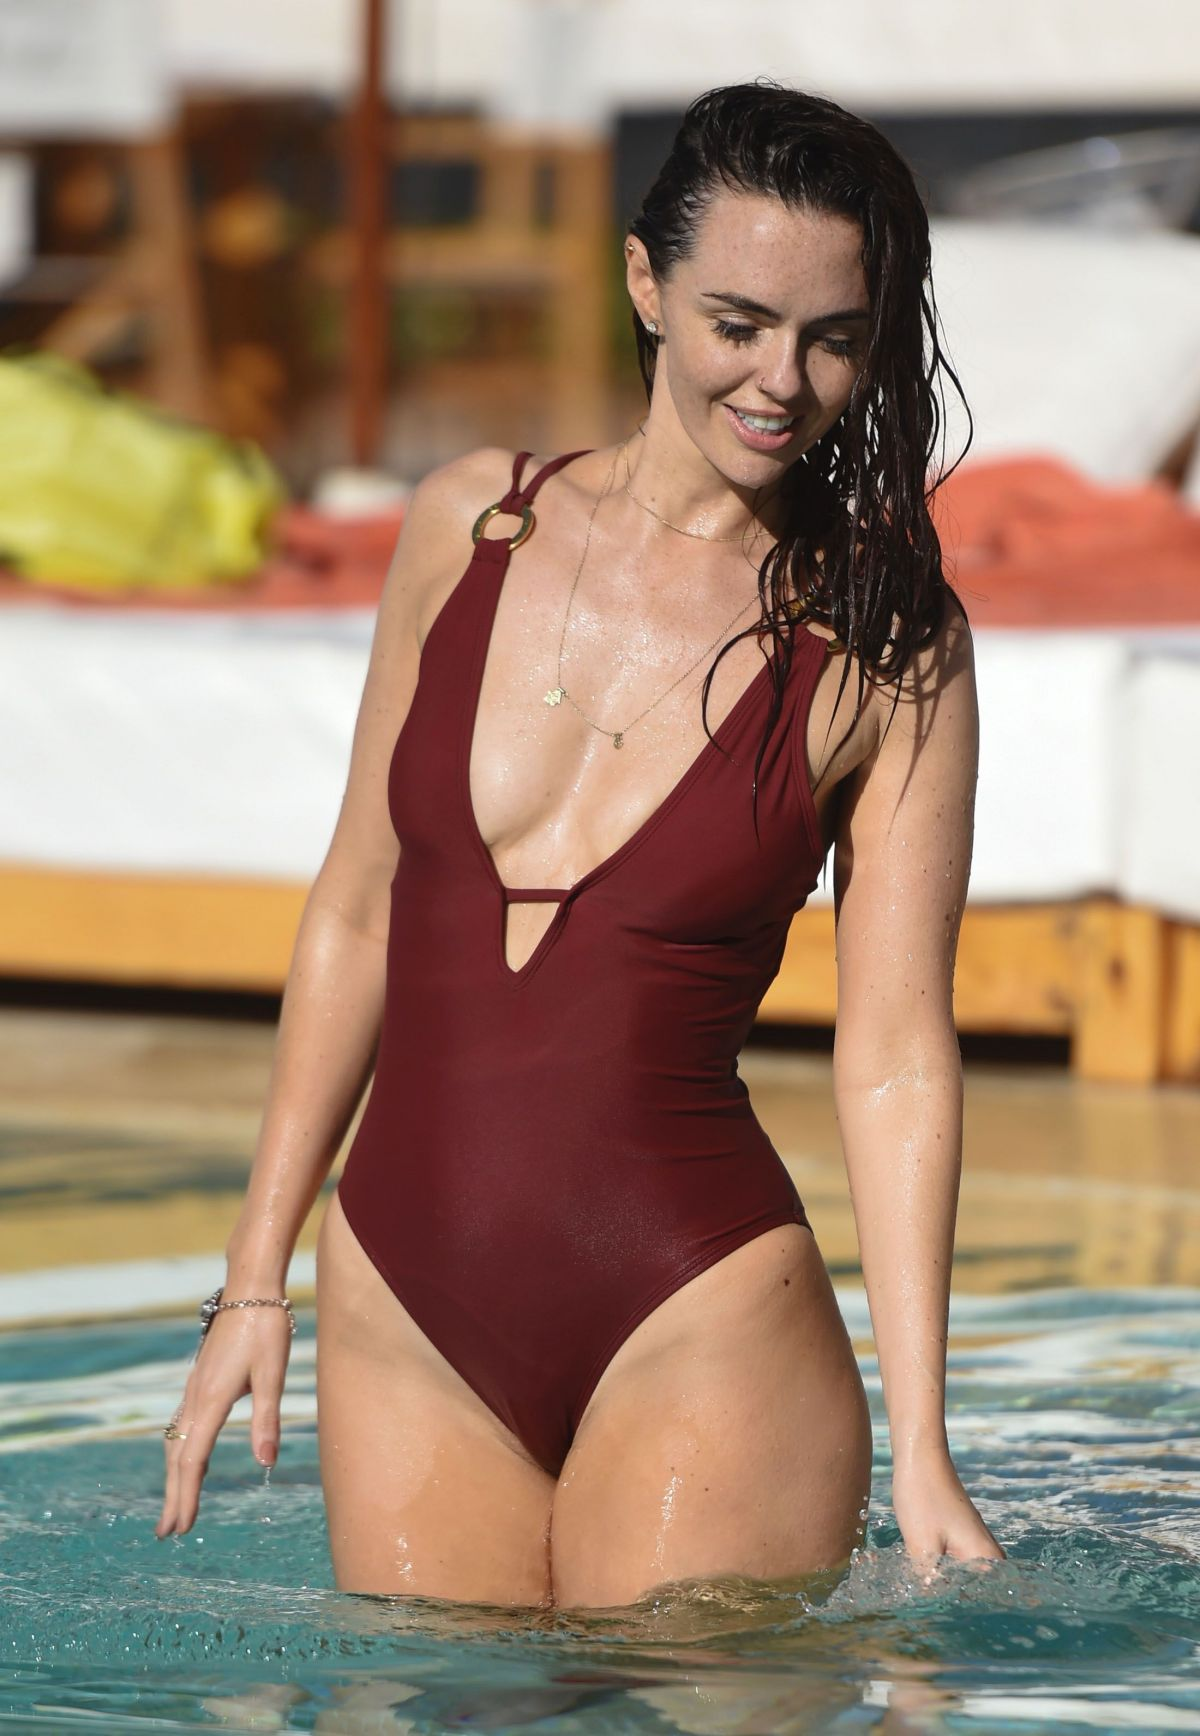 Pic Jennifer Metcalfe nude (84 photos), Pussy, Is a cute, Twitter, in bikini 2006